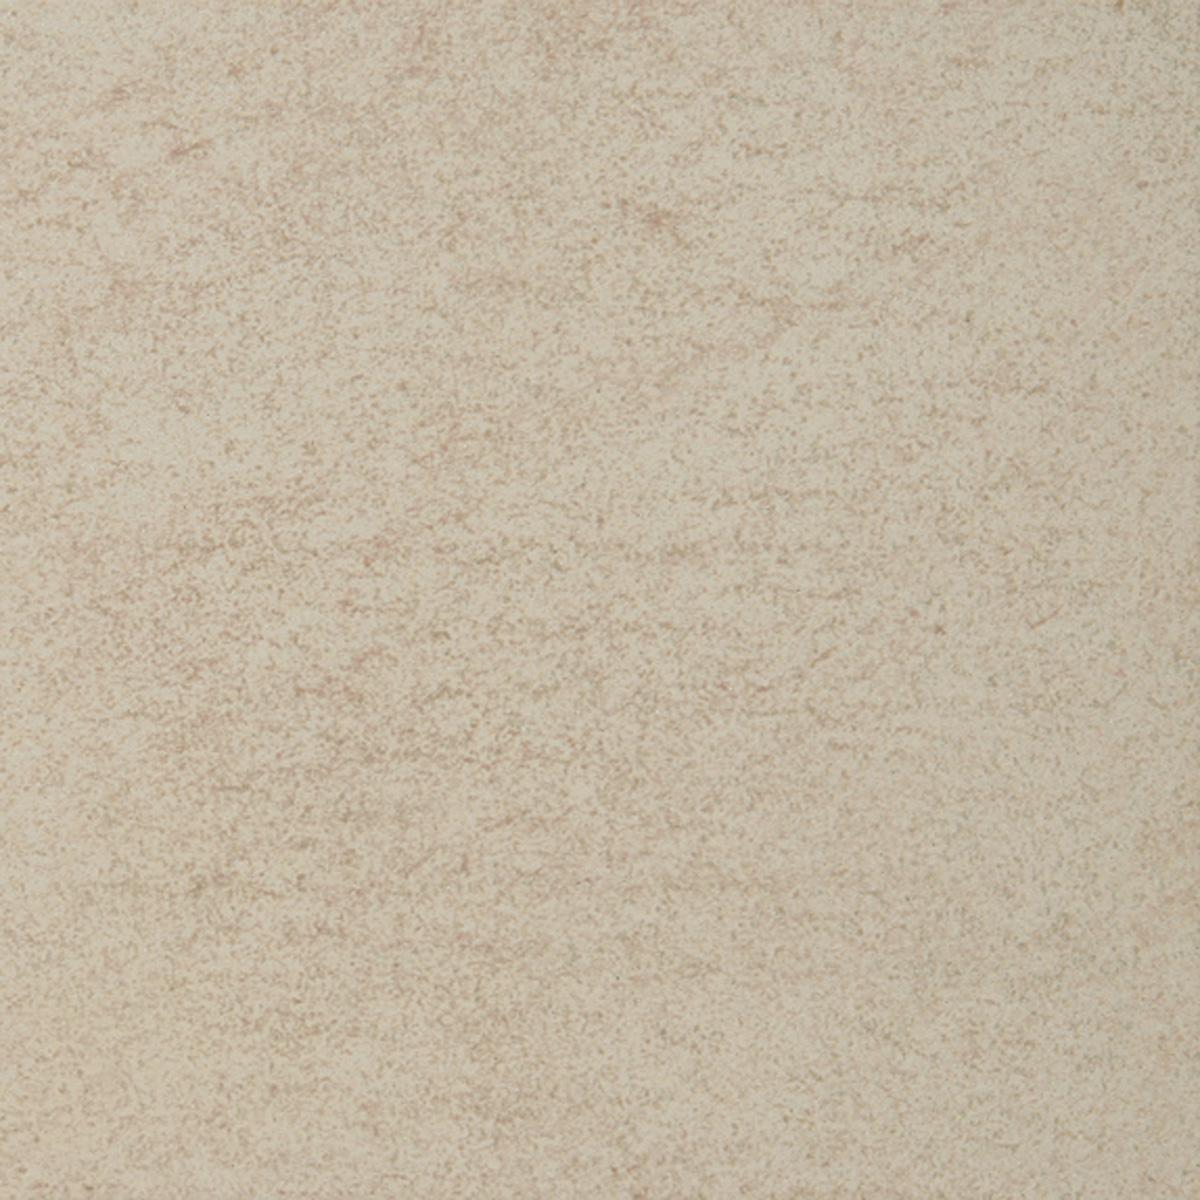 Gresie portelanata glazurata - Blanco 31x31 - AMBERES GALA - Poza 3